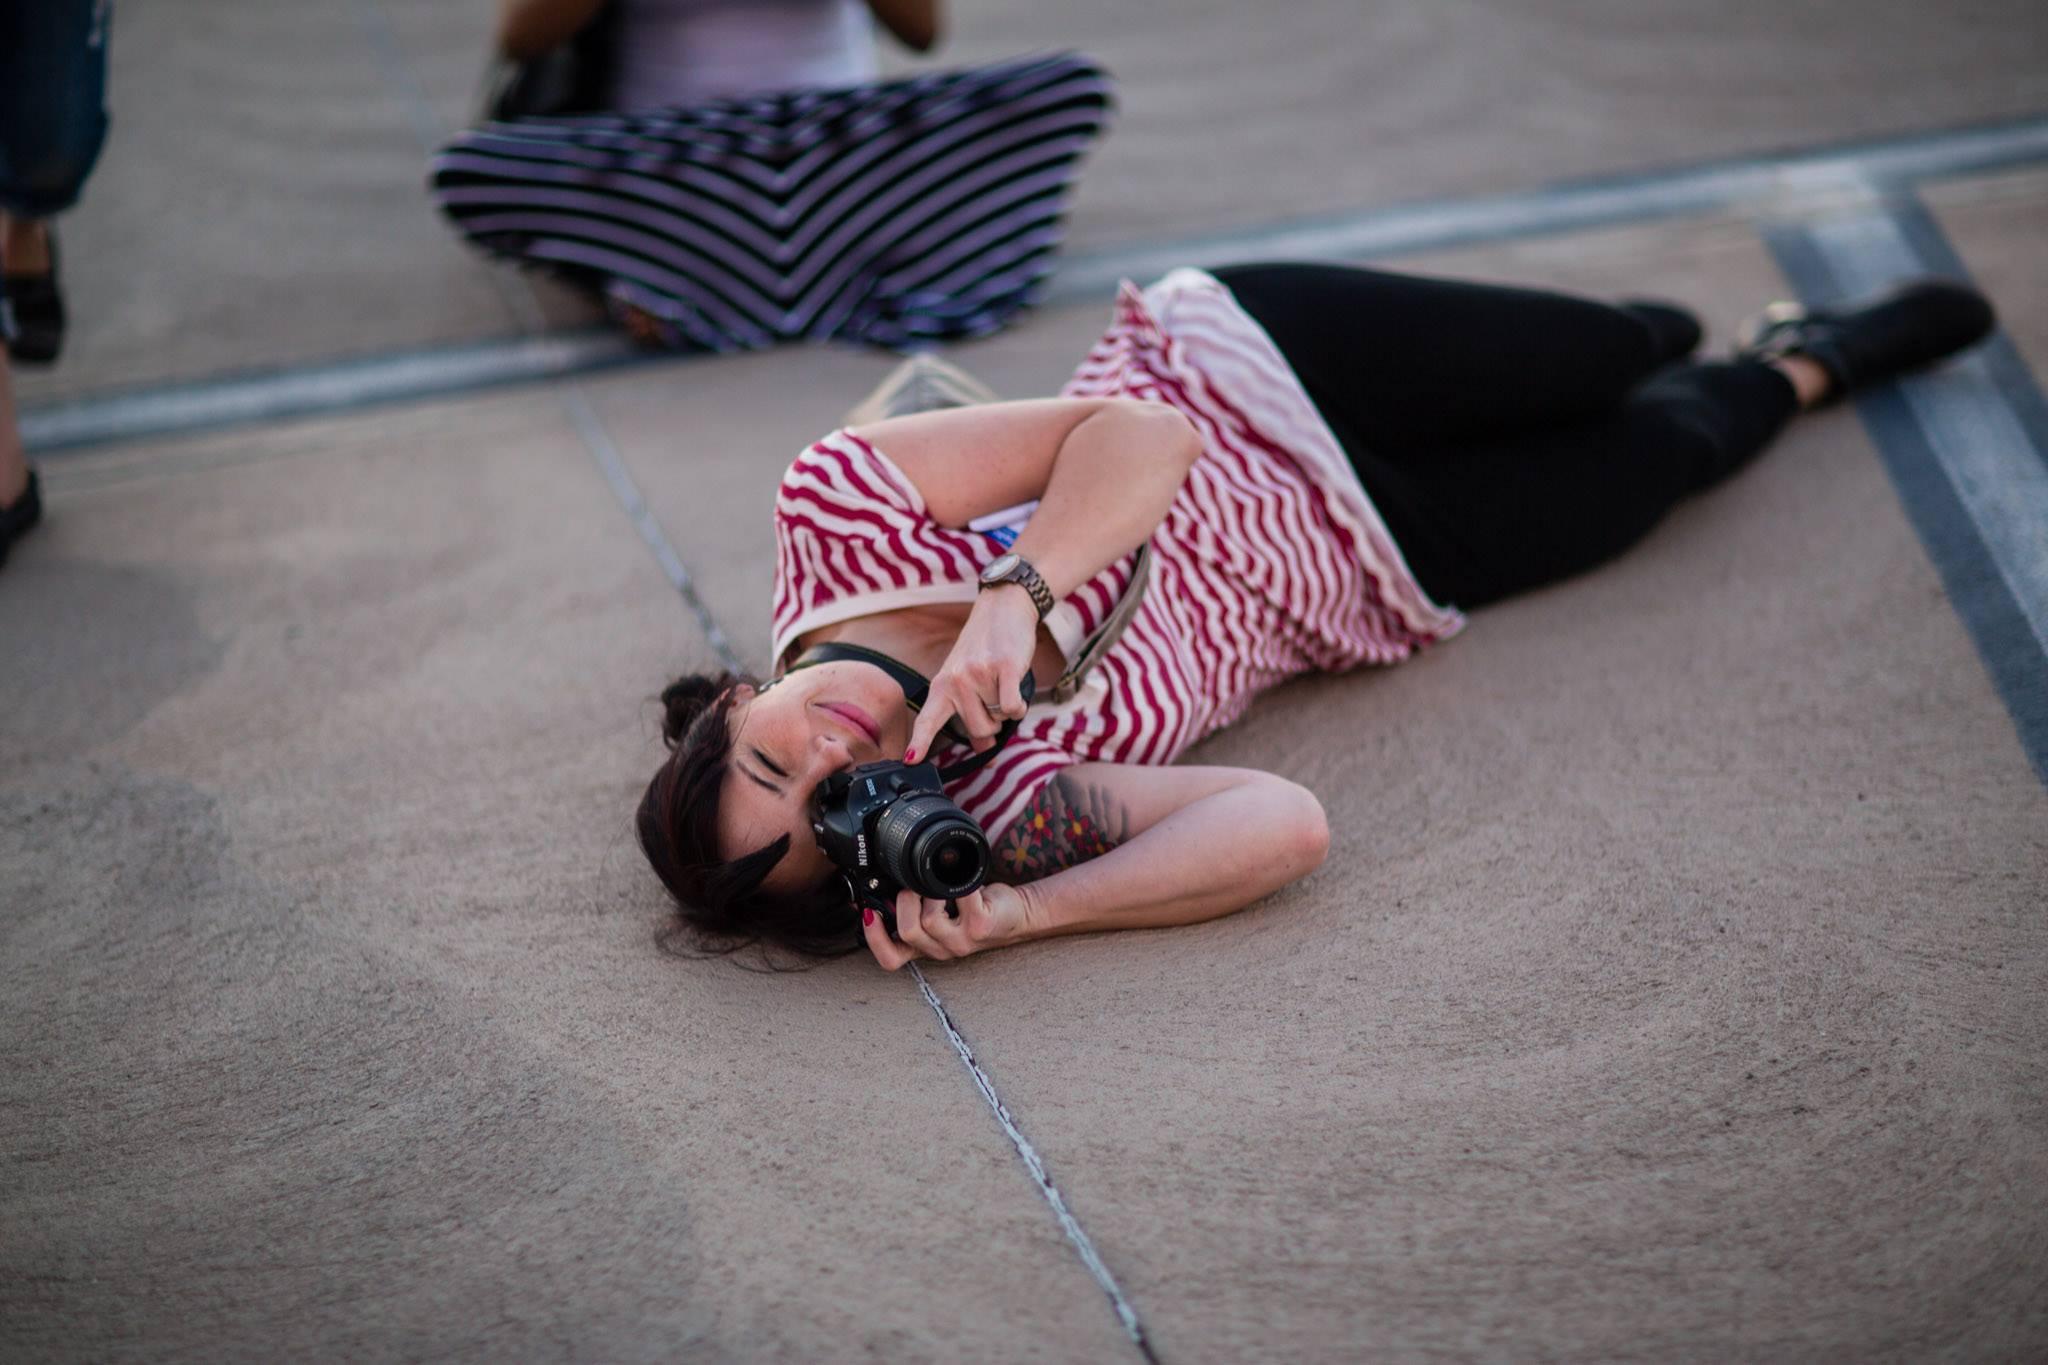 Photographer suicide prevention